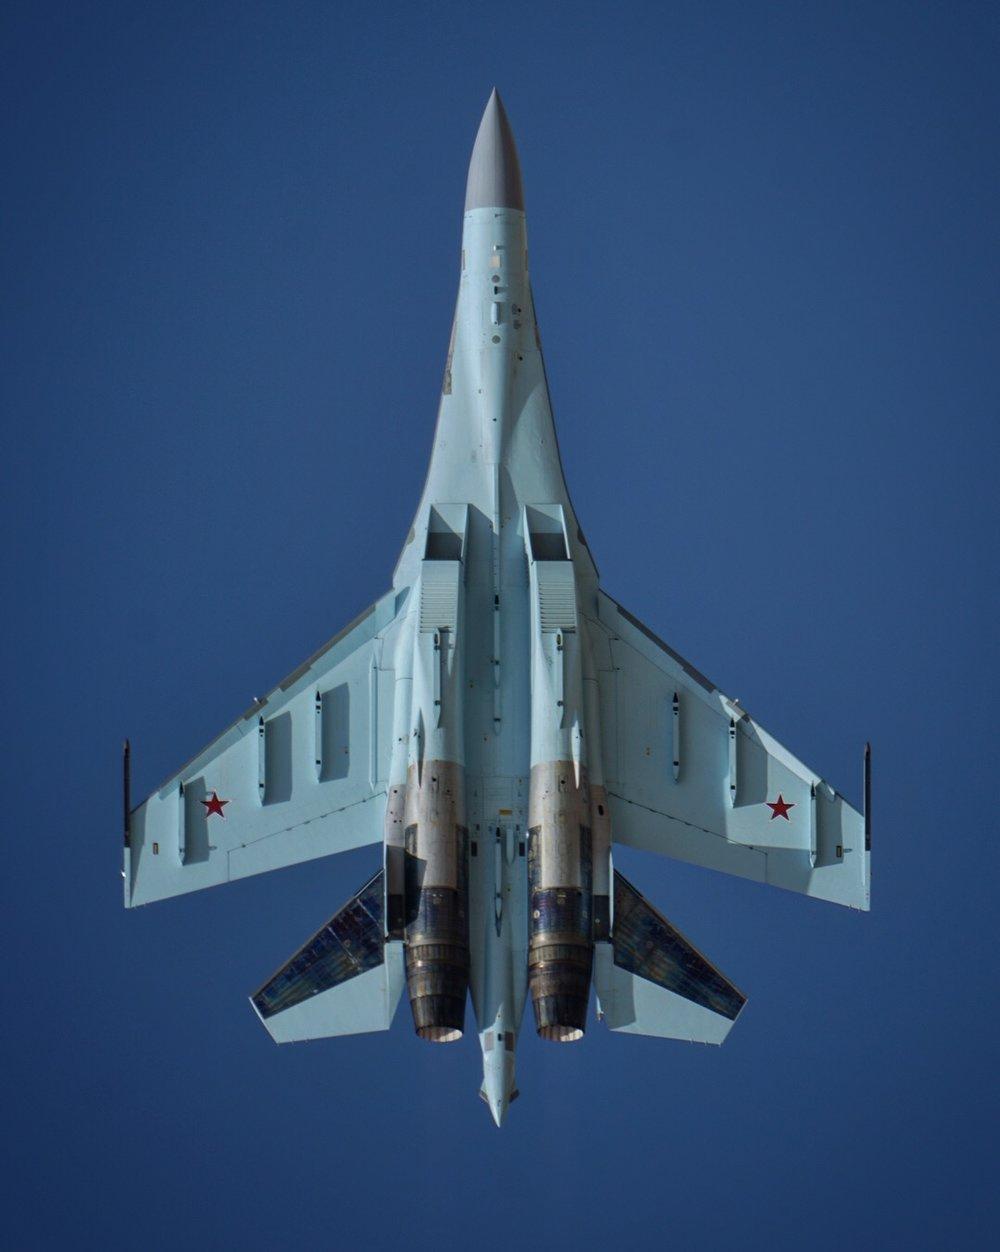 A Russian SU-35 at the 2017 Dubai Airshow